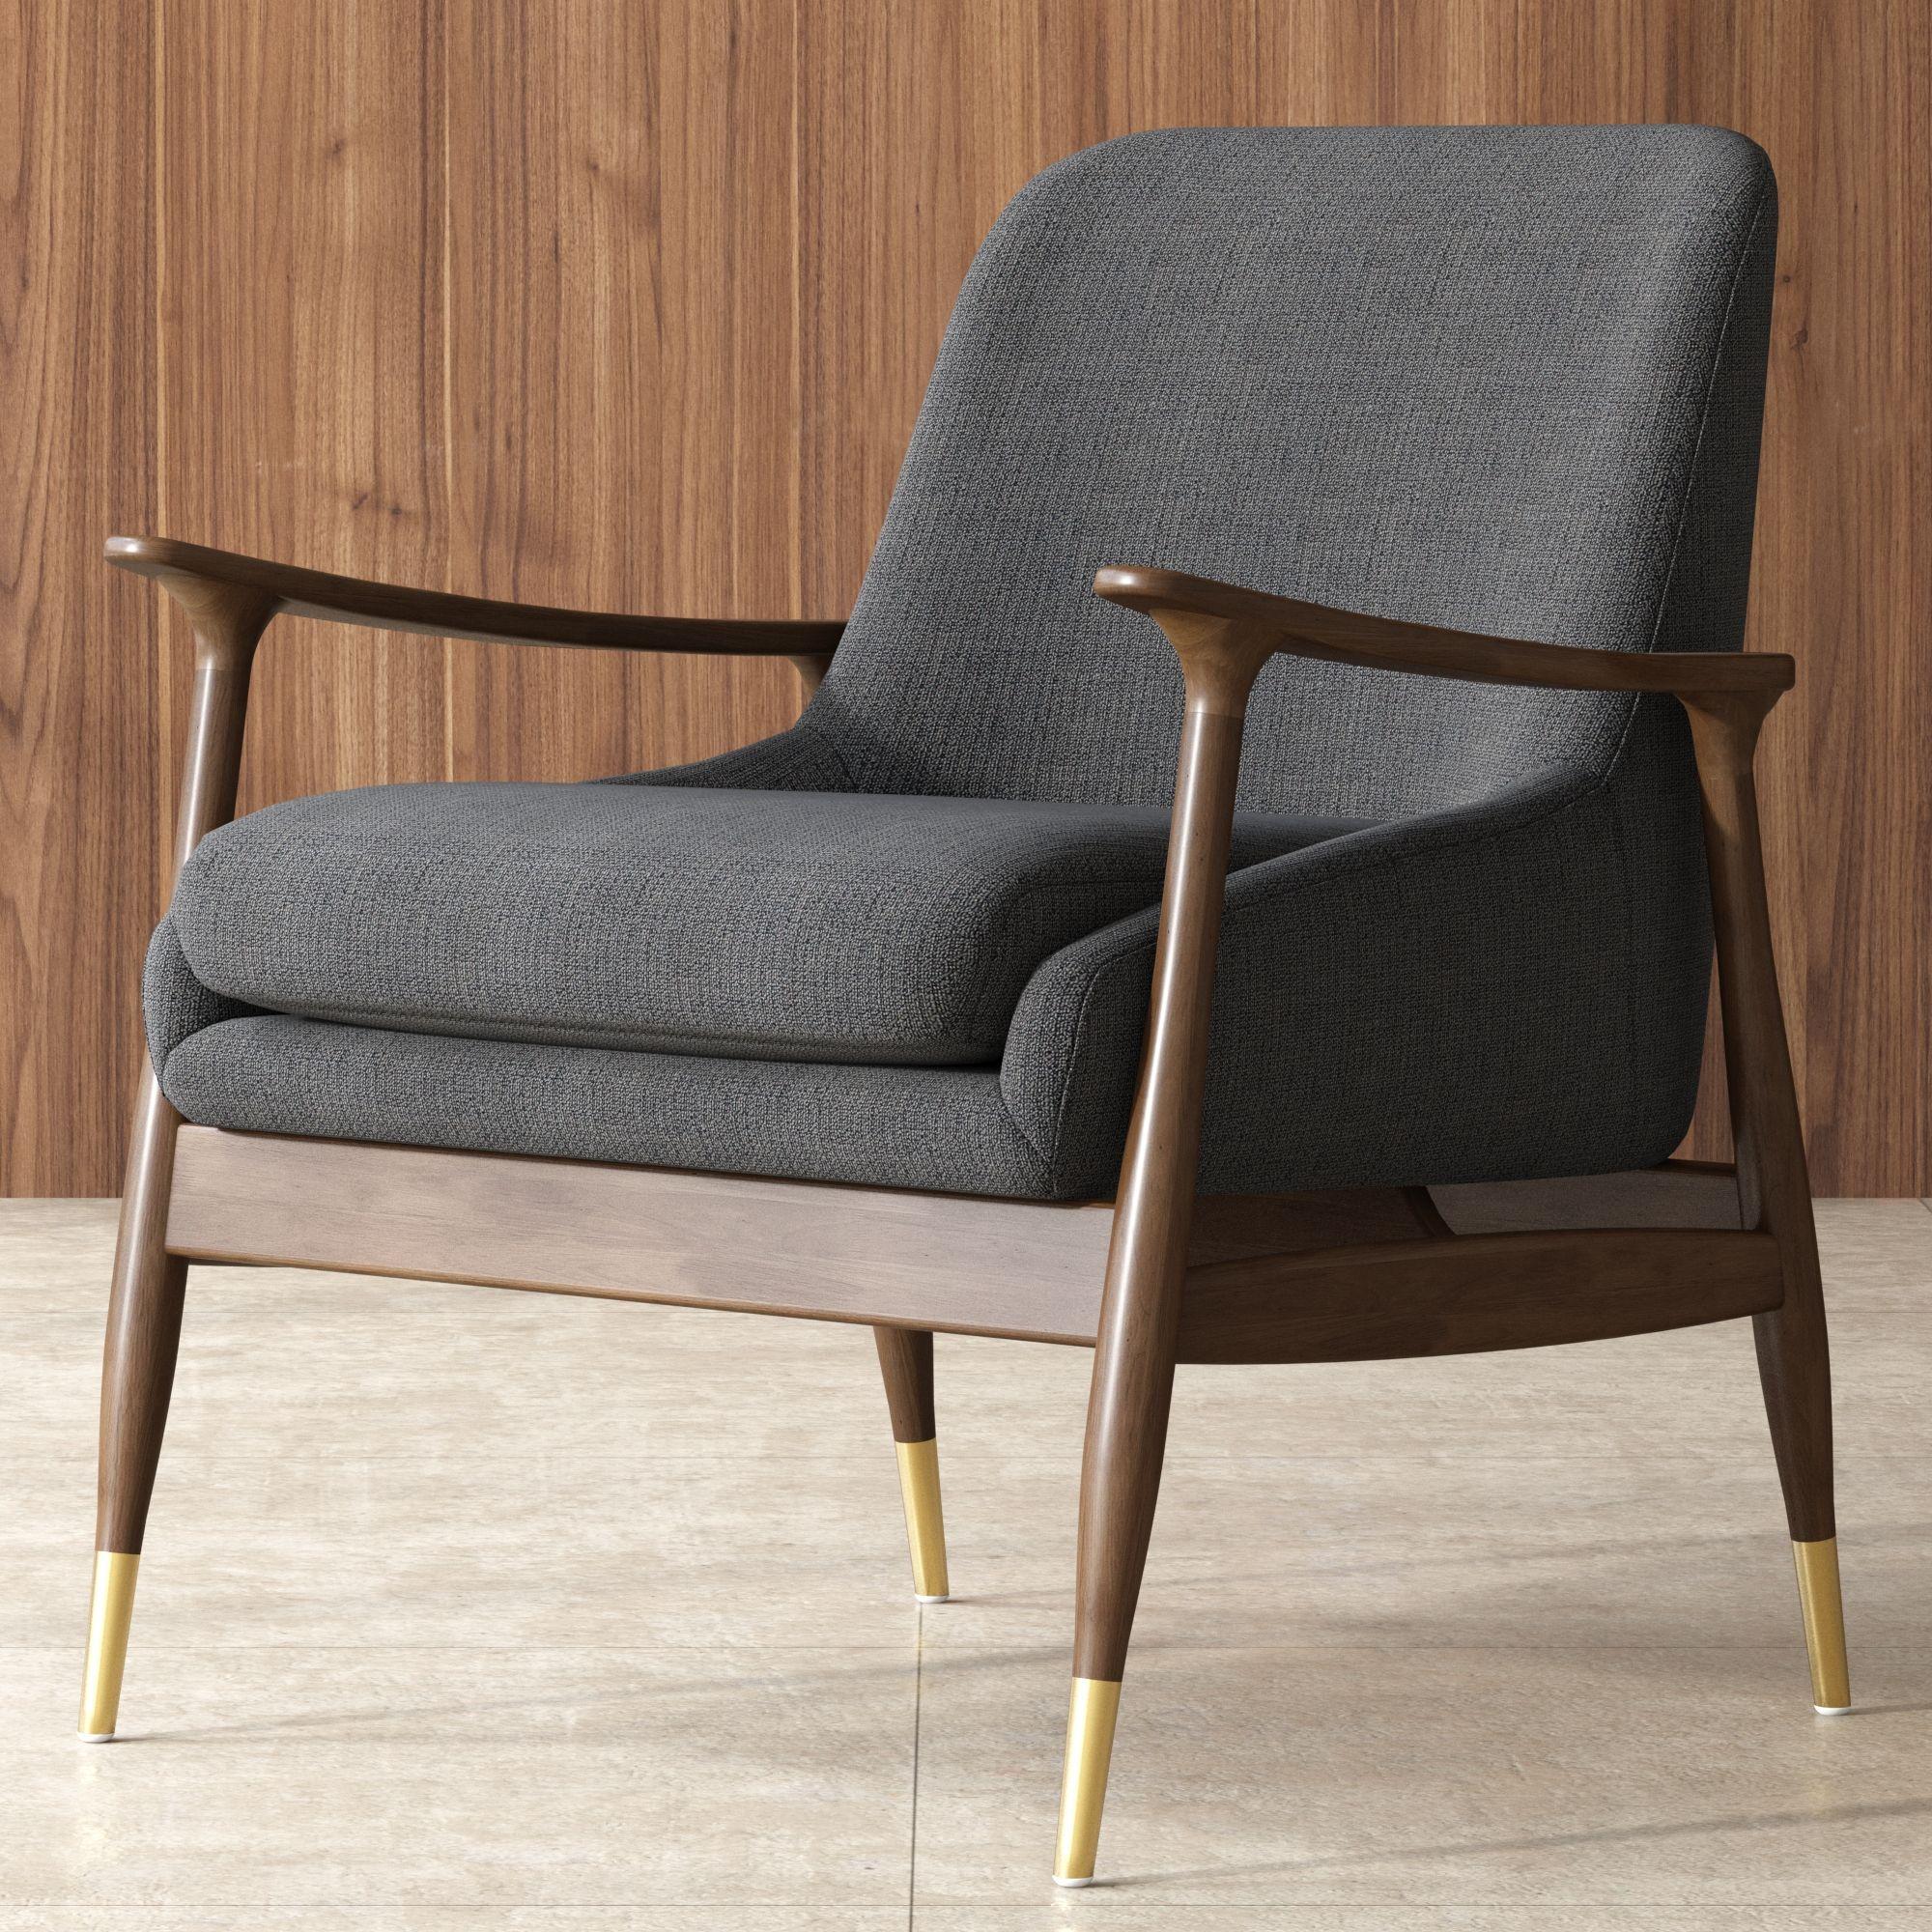 Desmond Armchair Stone Gray Castlery In 2021 Armchairs Living Room Modern Mid Century Modern Armchair Mid Century Armchair